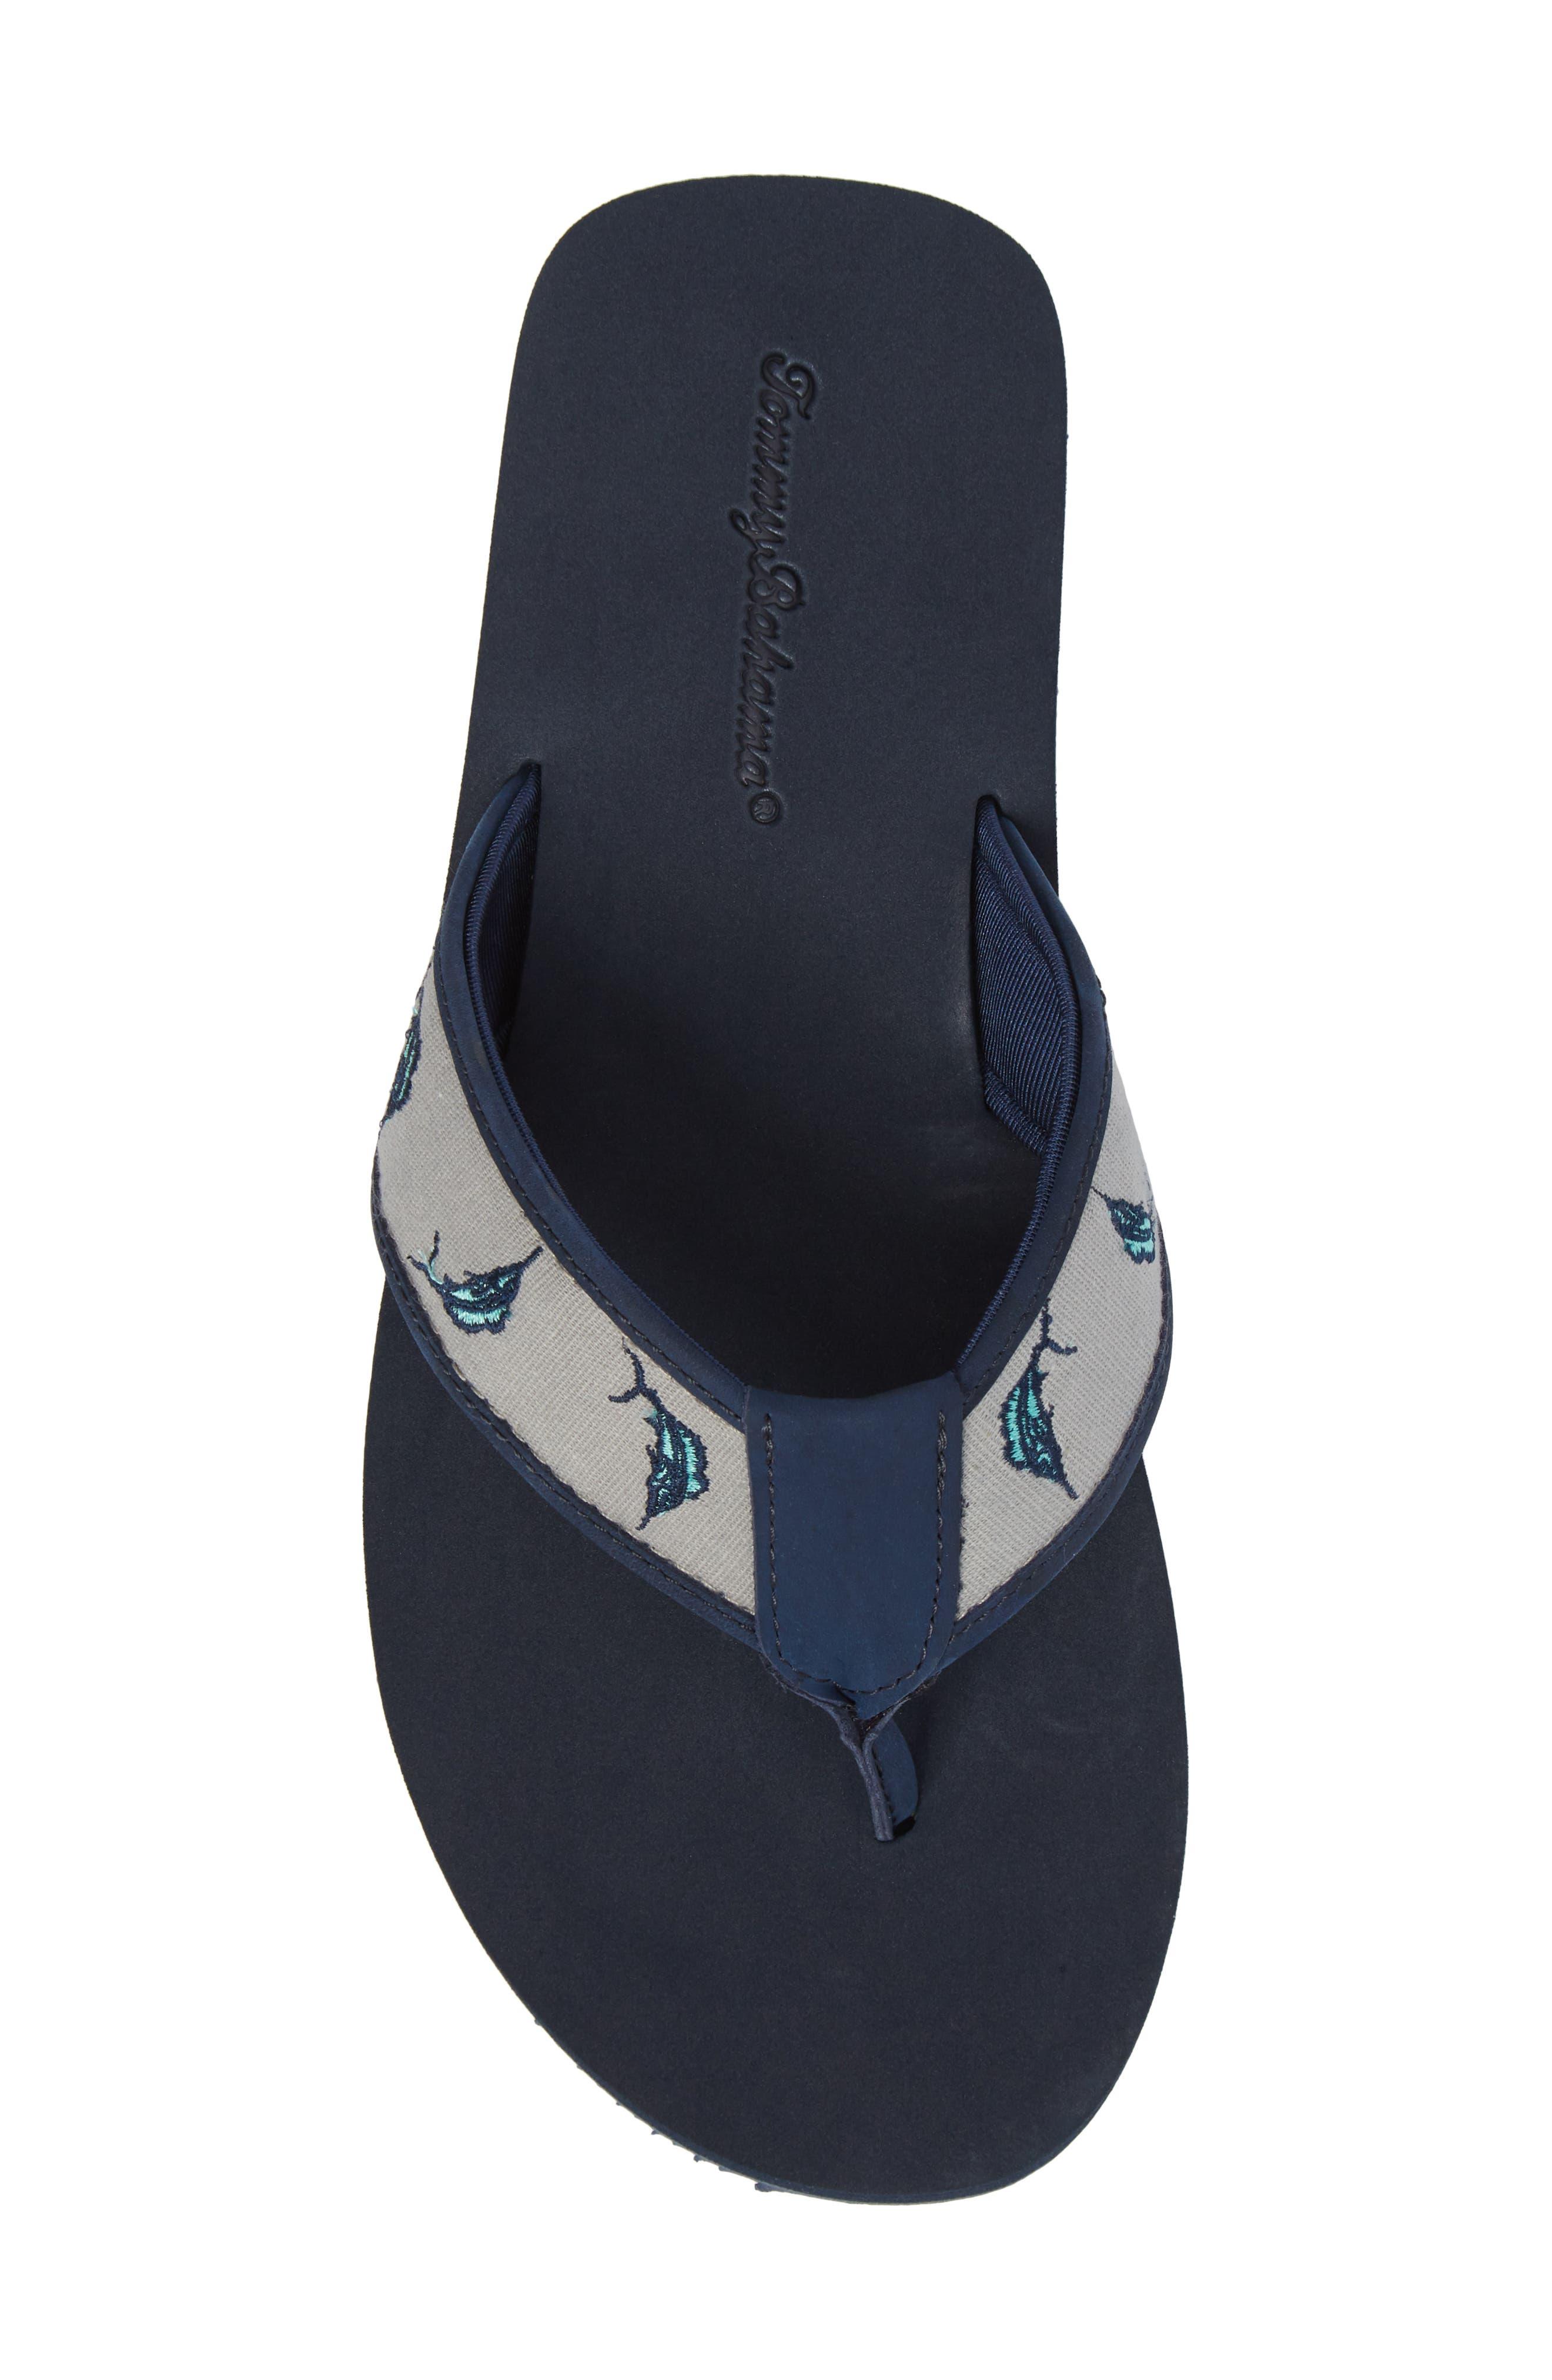 Allegro Flip Flop,                             Alternate thumbnail 5, color,                             Navy Canvas/ Leather